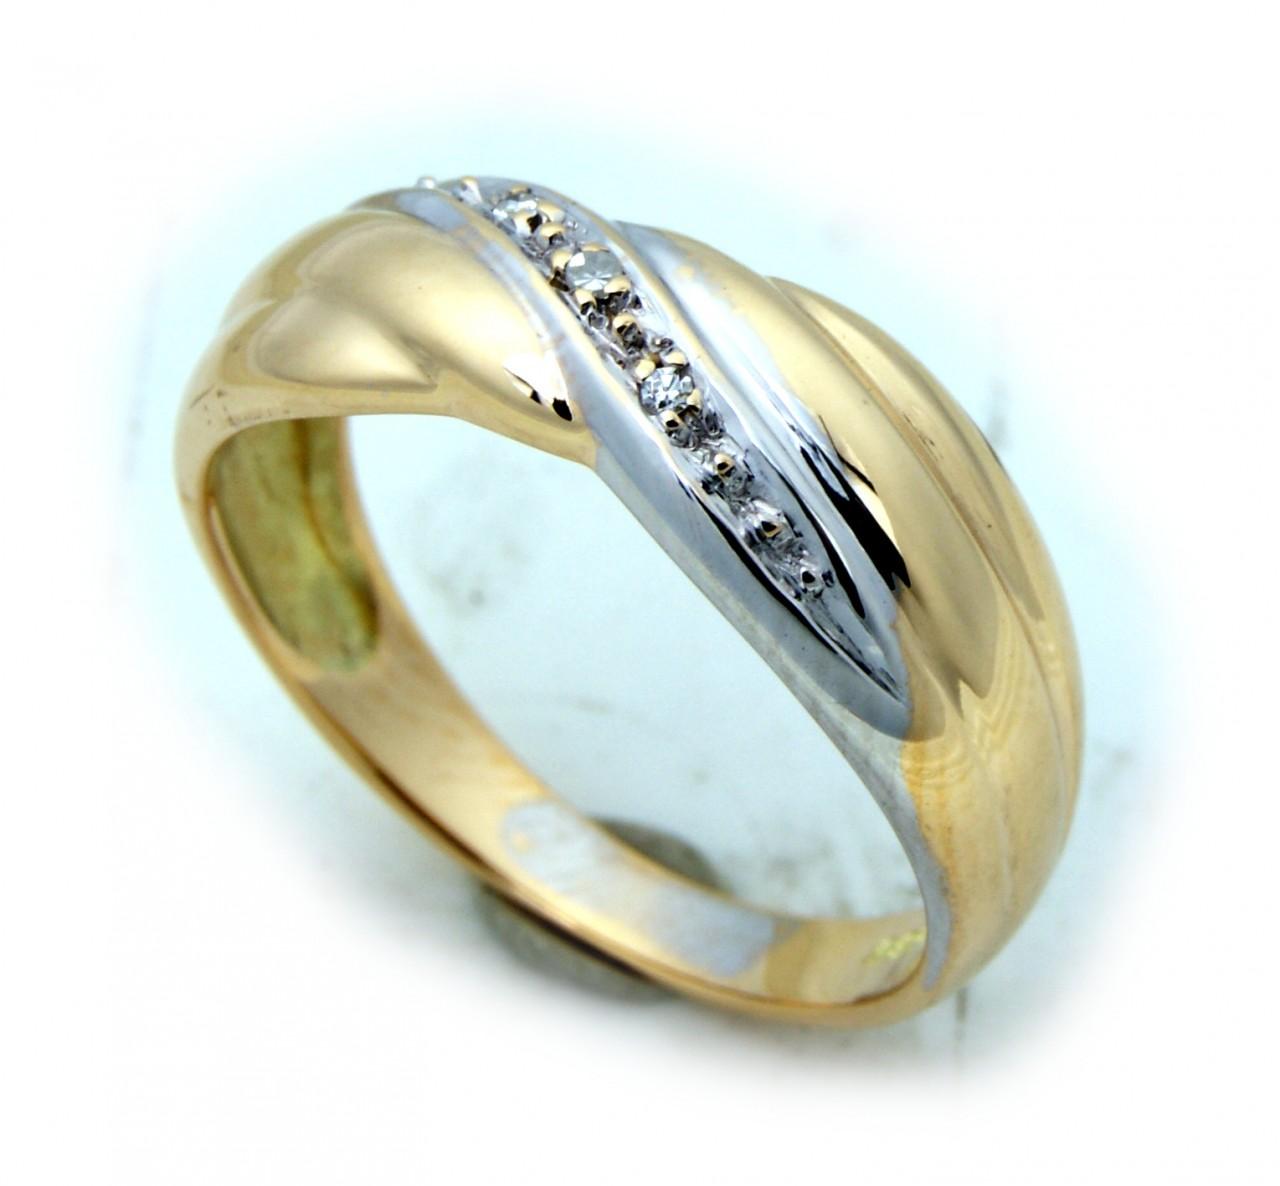 Damen Ring Brillant 0,03 carat w si echt Gold 585 Glanz Gelbgold Diamant